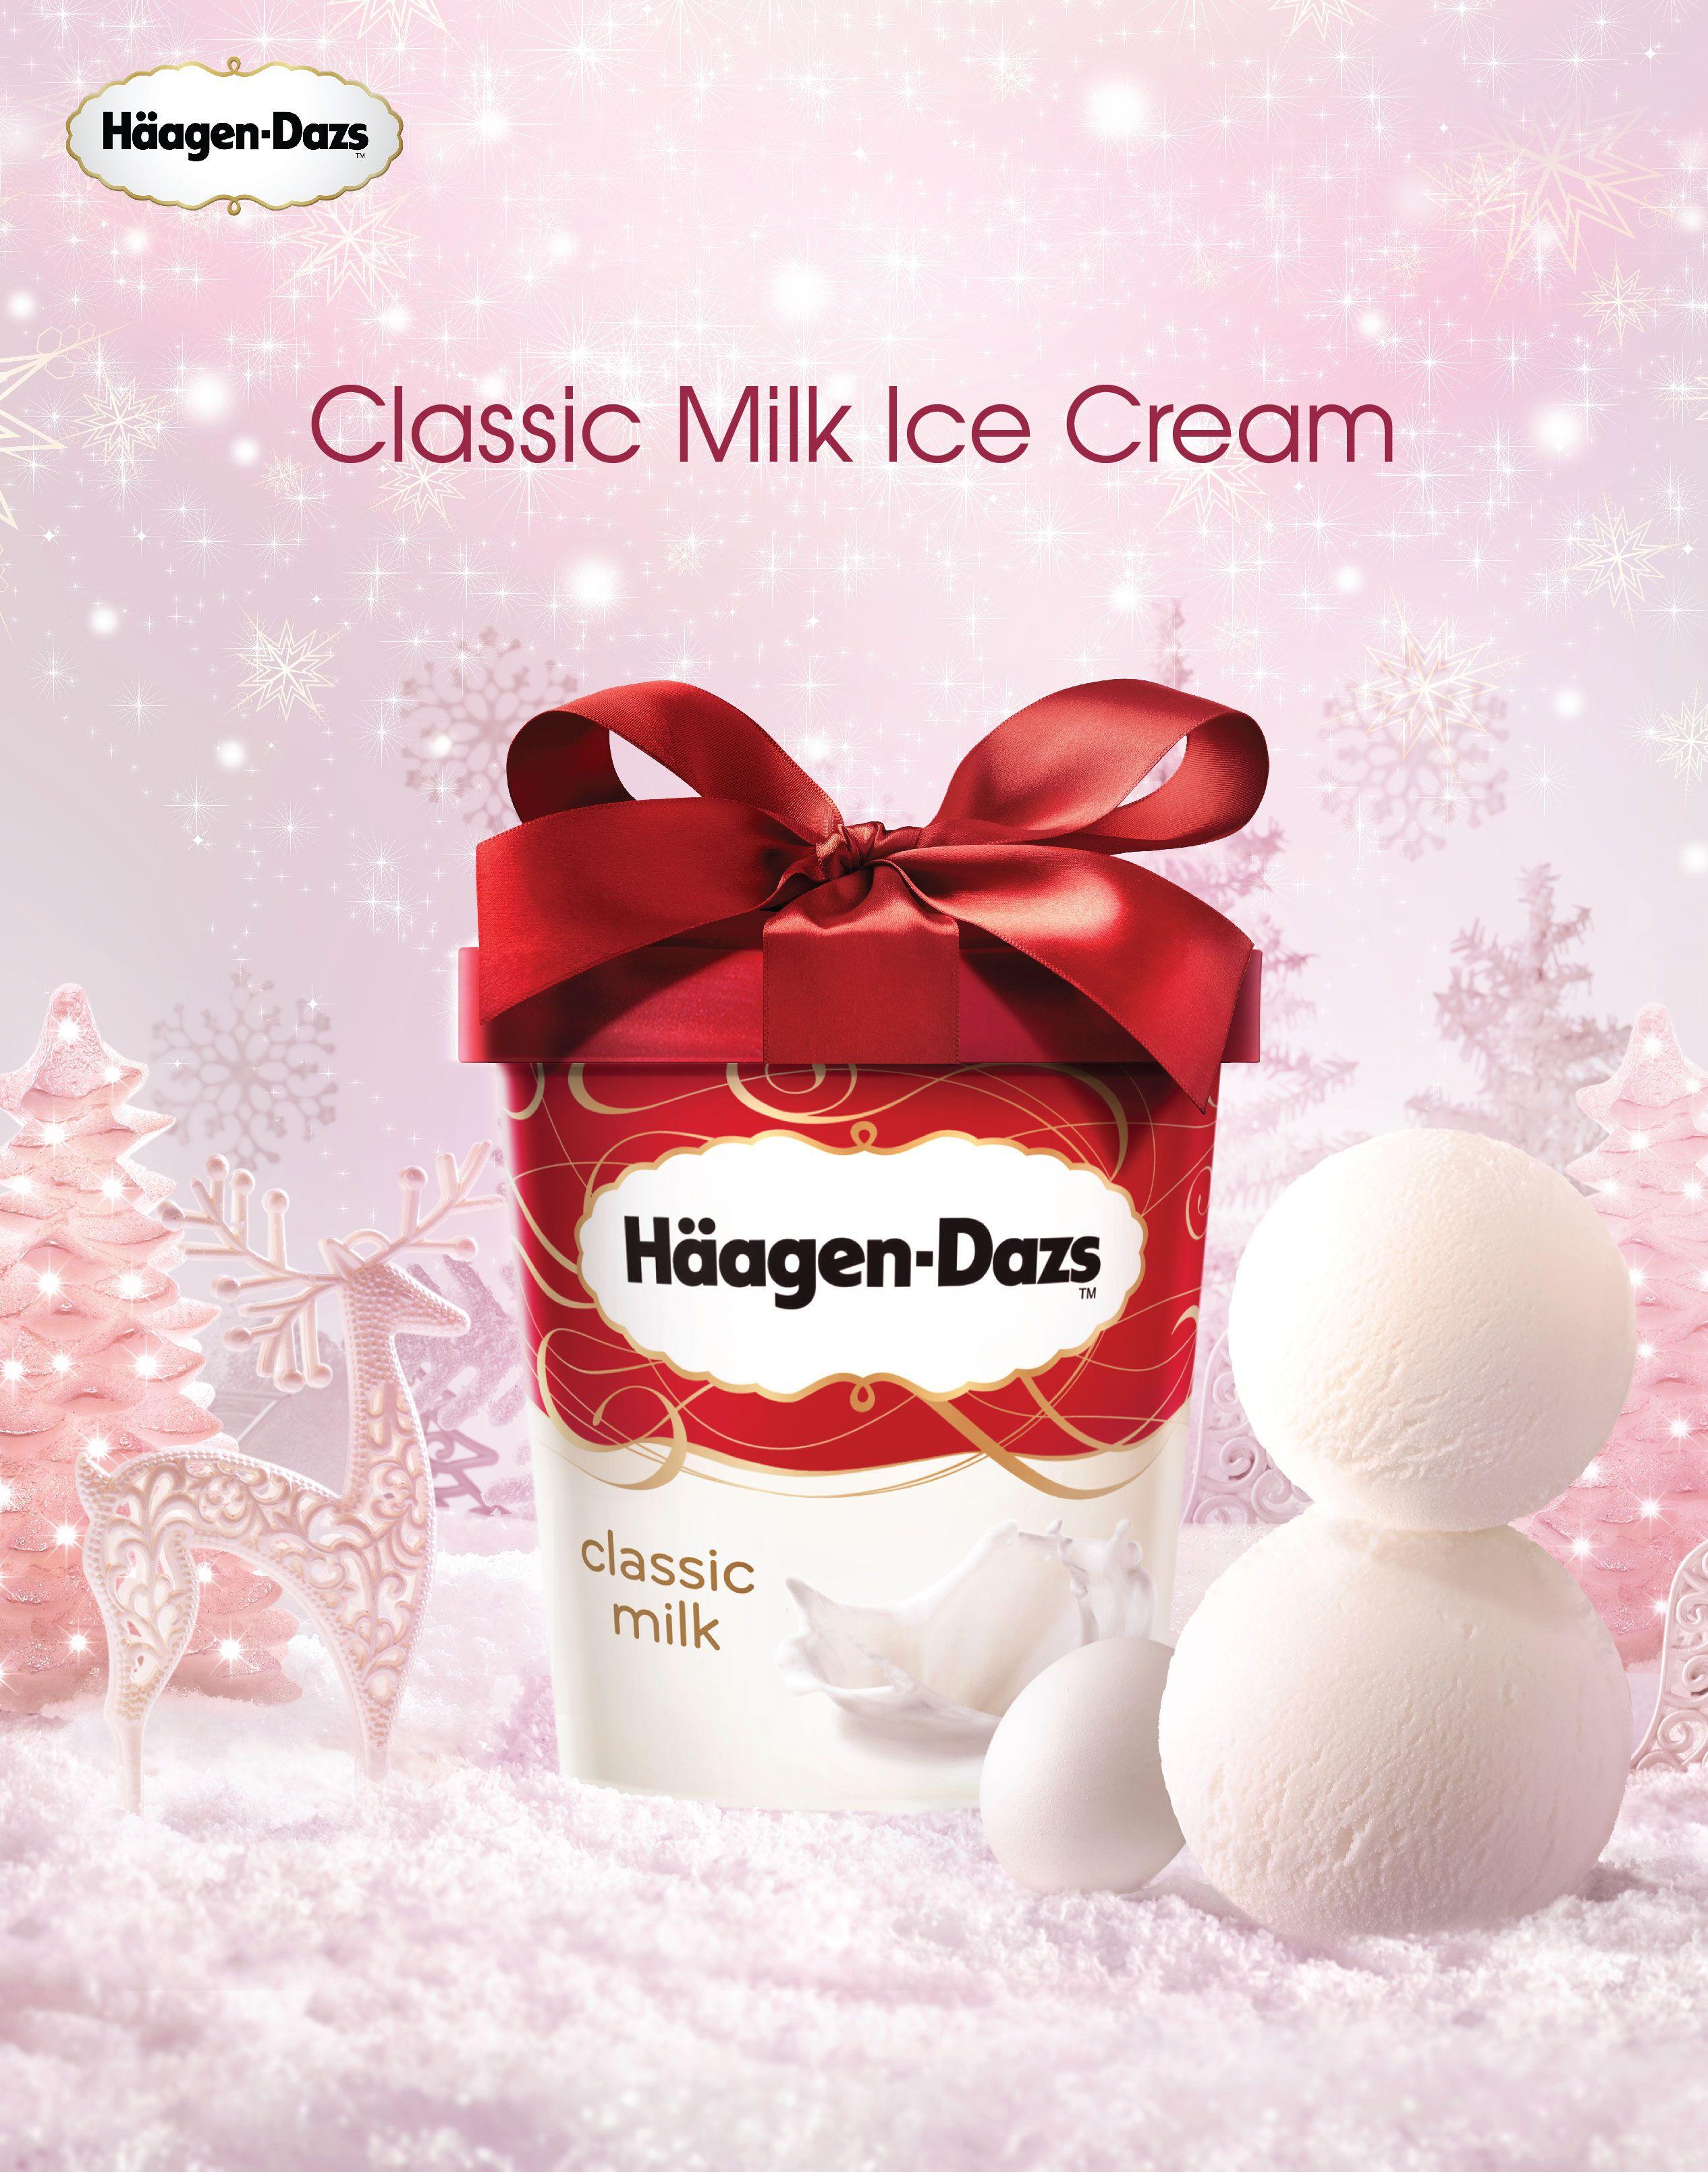 Haagen Dazs X Mas Classic Milk Ice Cream Christmas Advertising Food Poster Design Haagen Dazs